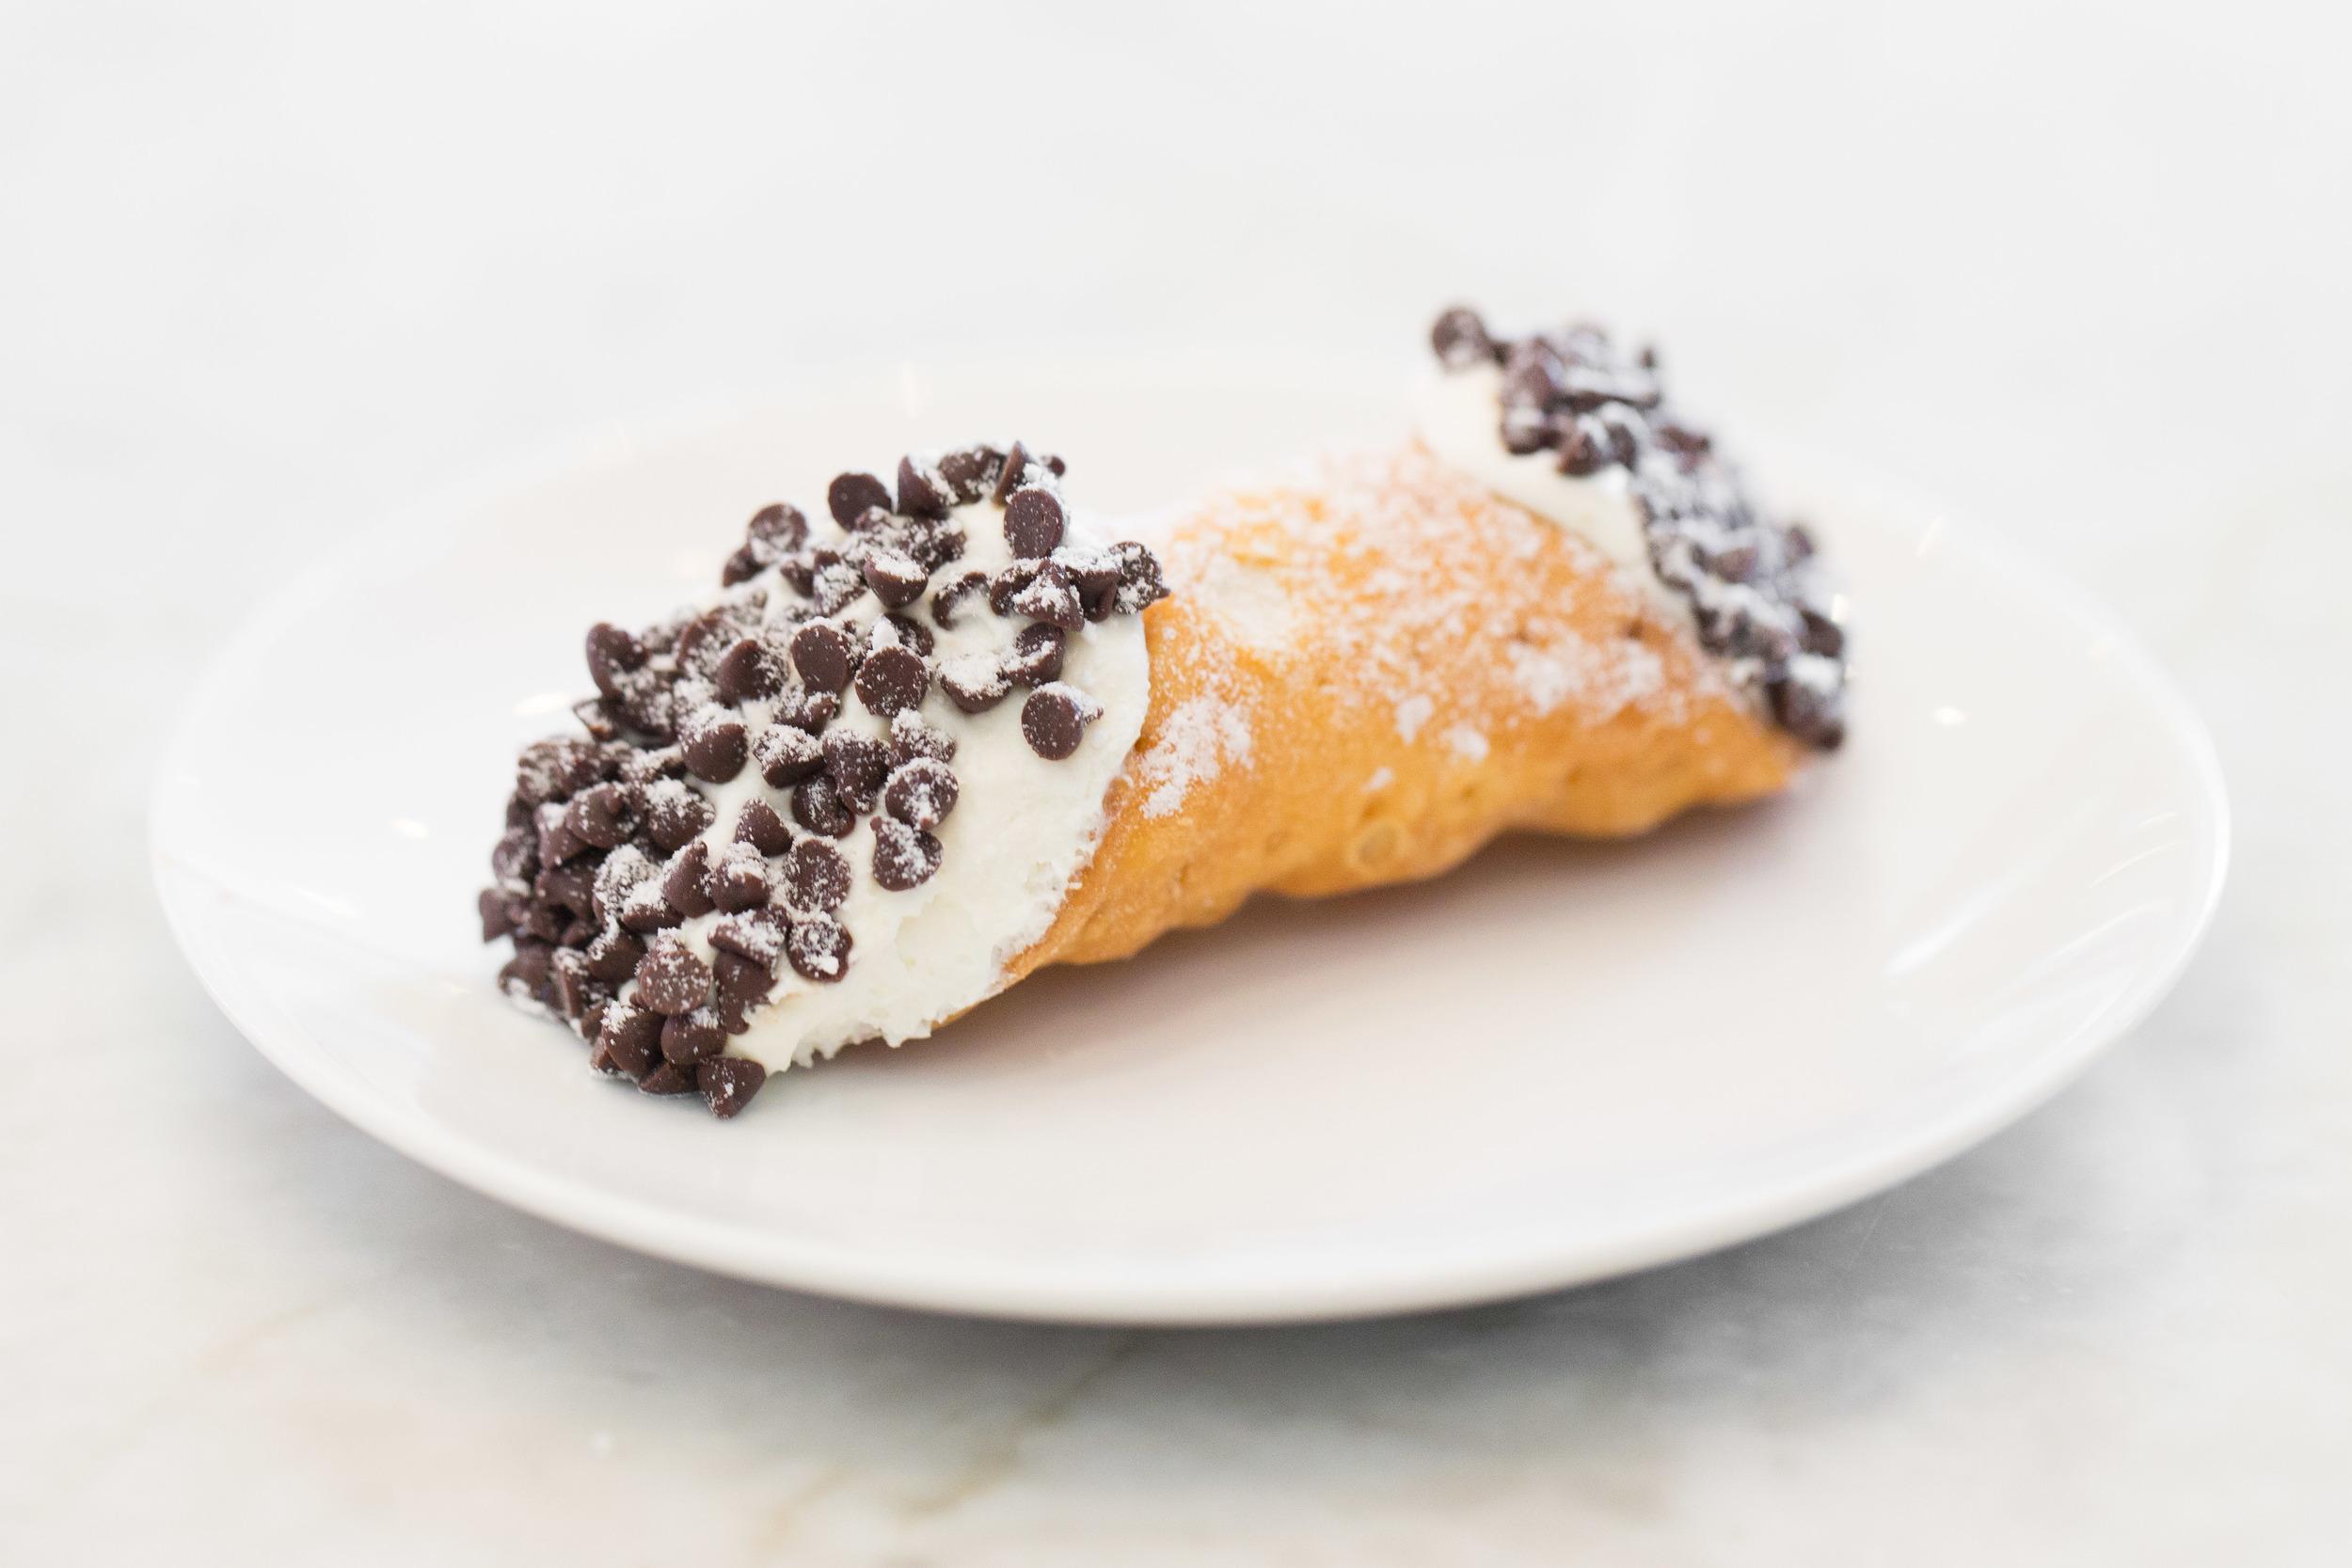 Chocolate Chip Cannoli